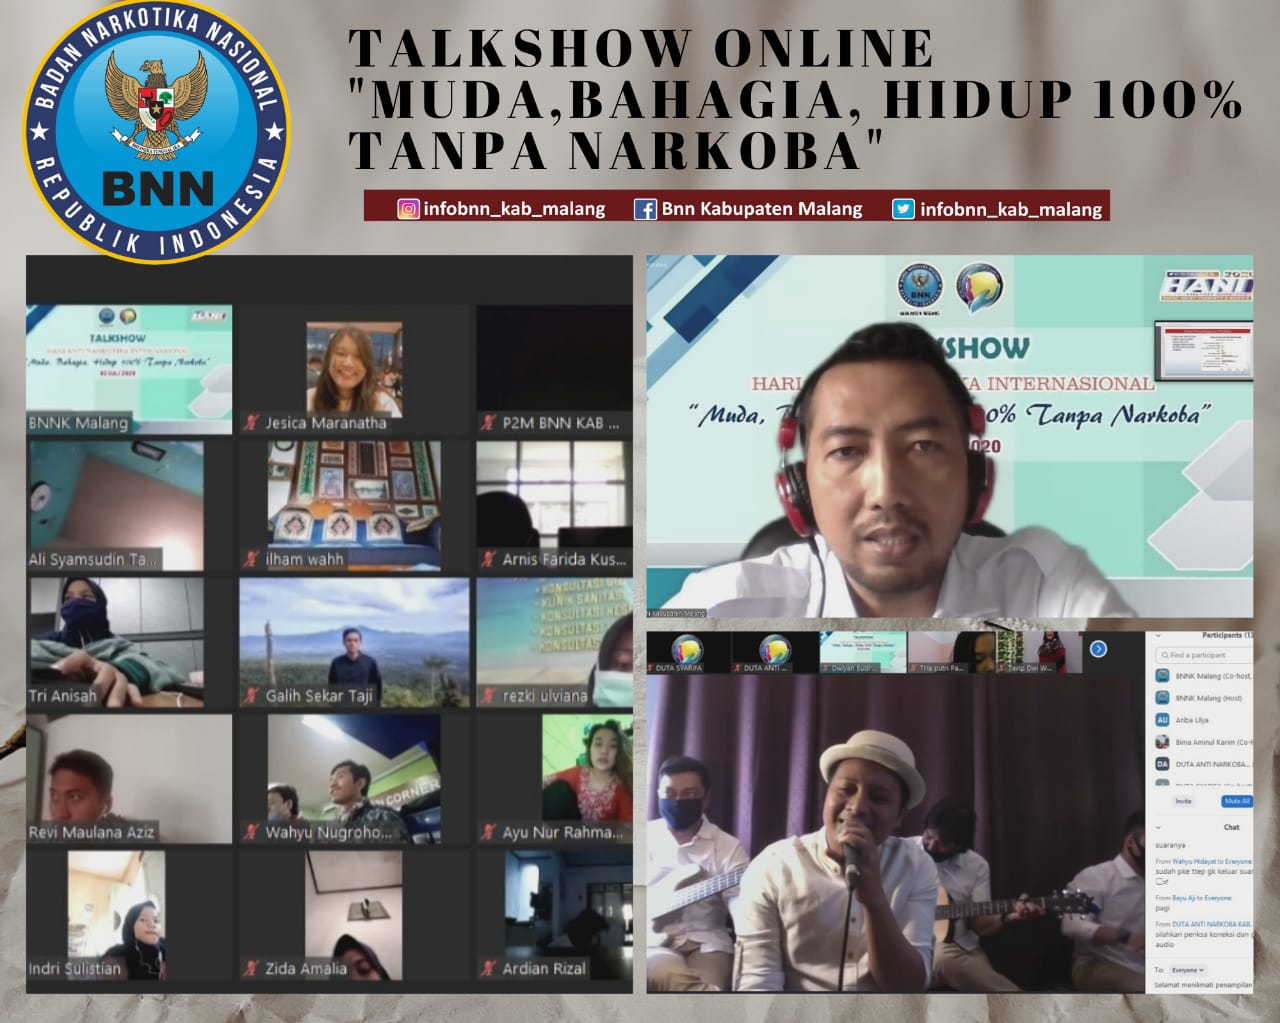 Talkshow Muda, Bahagia, Hidup 100% Tanpa Narkoba